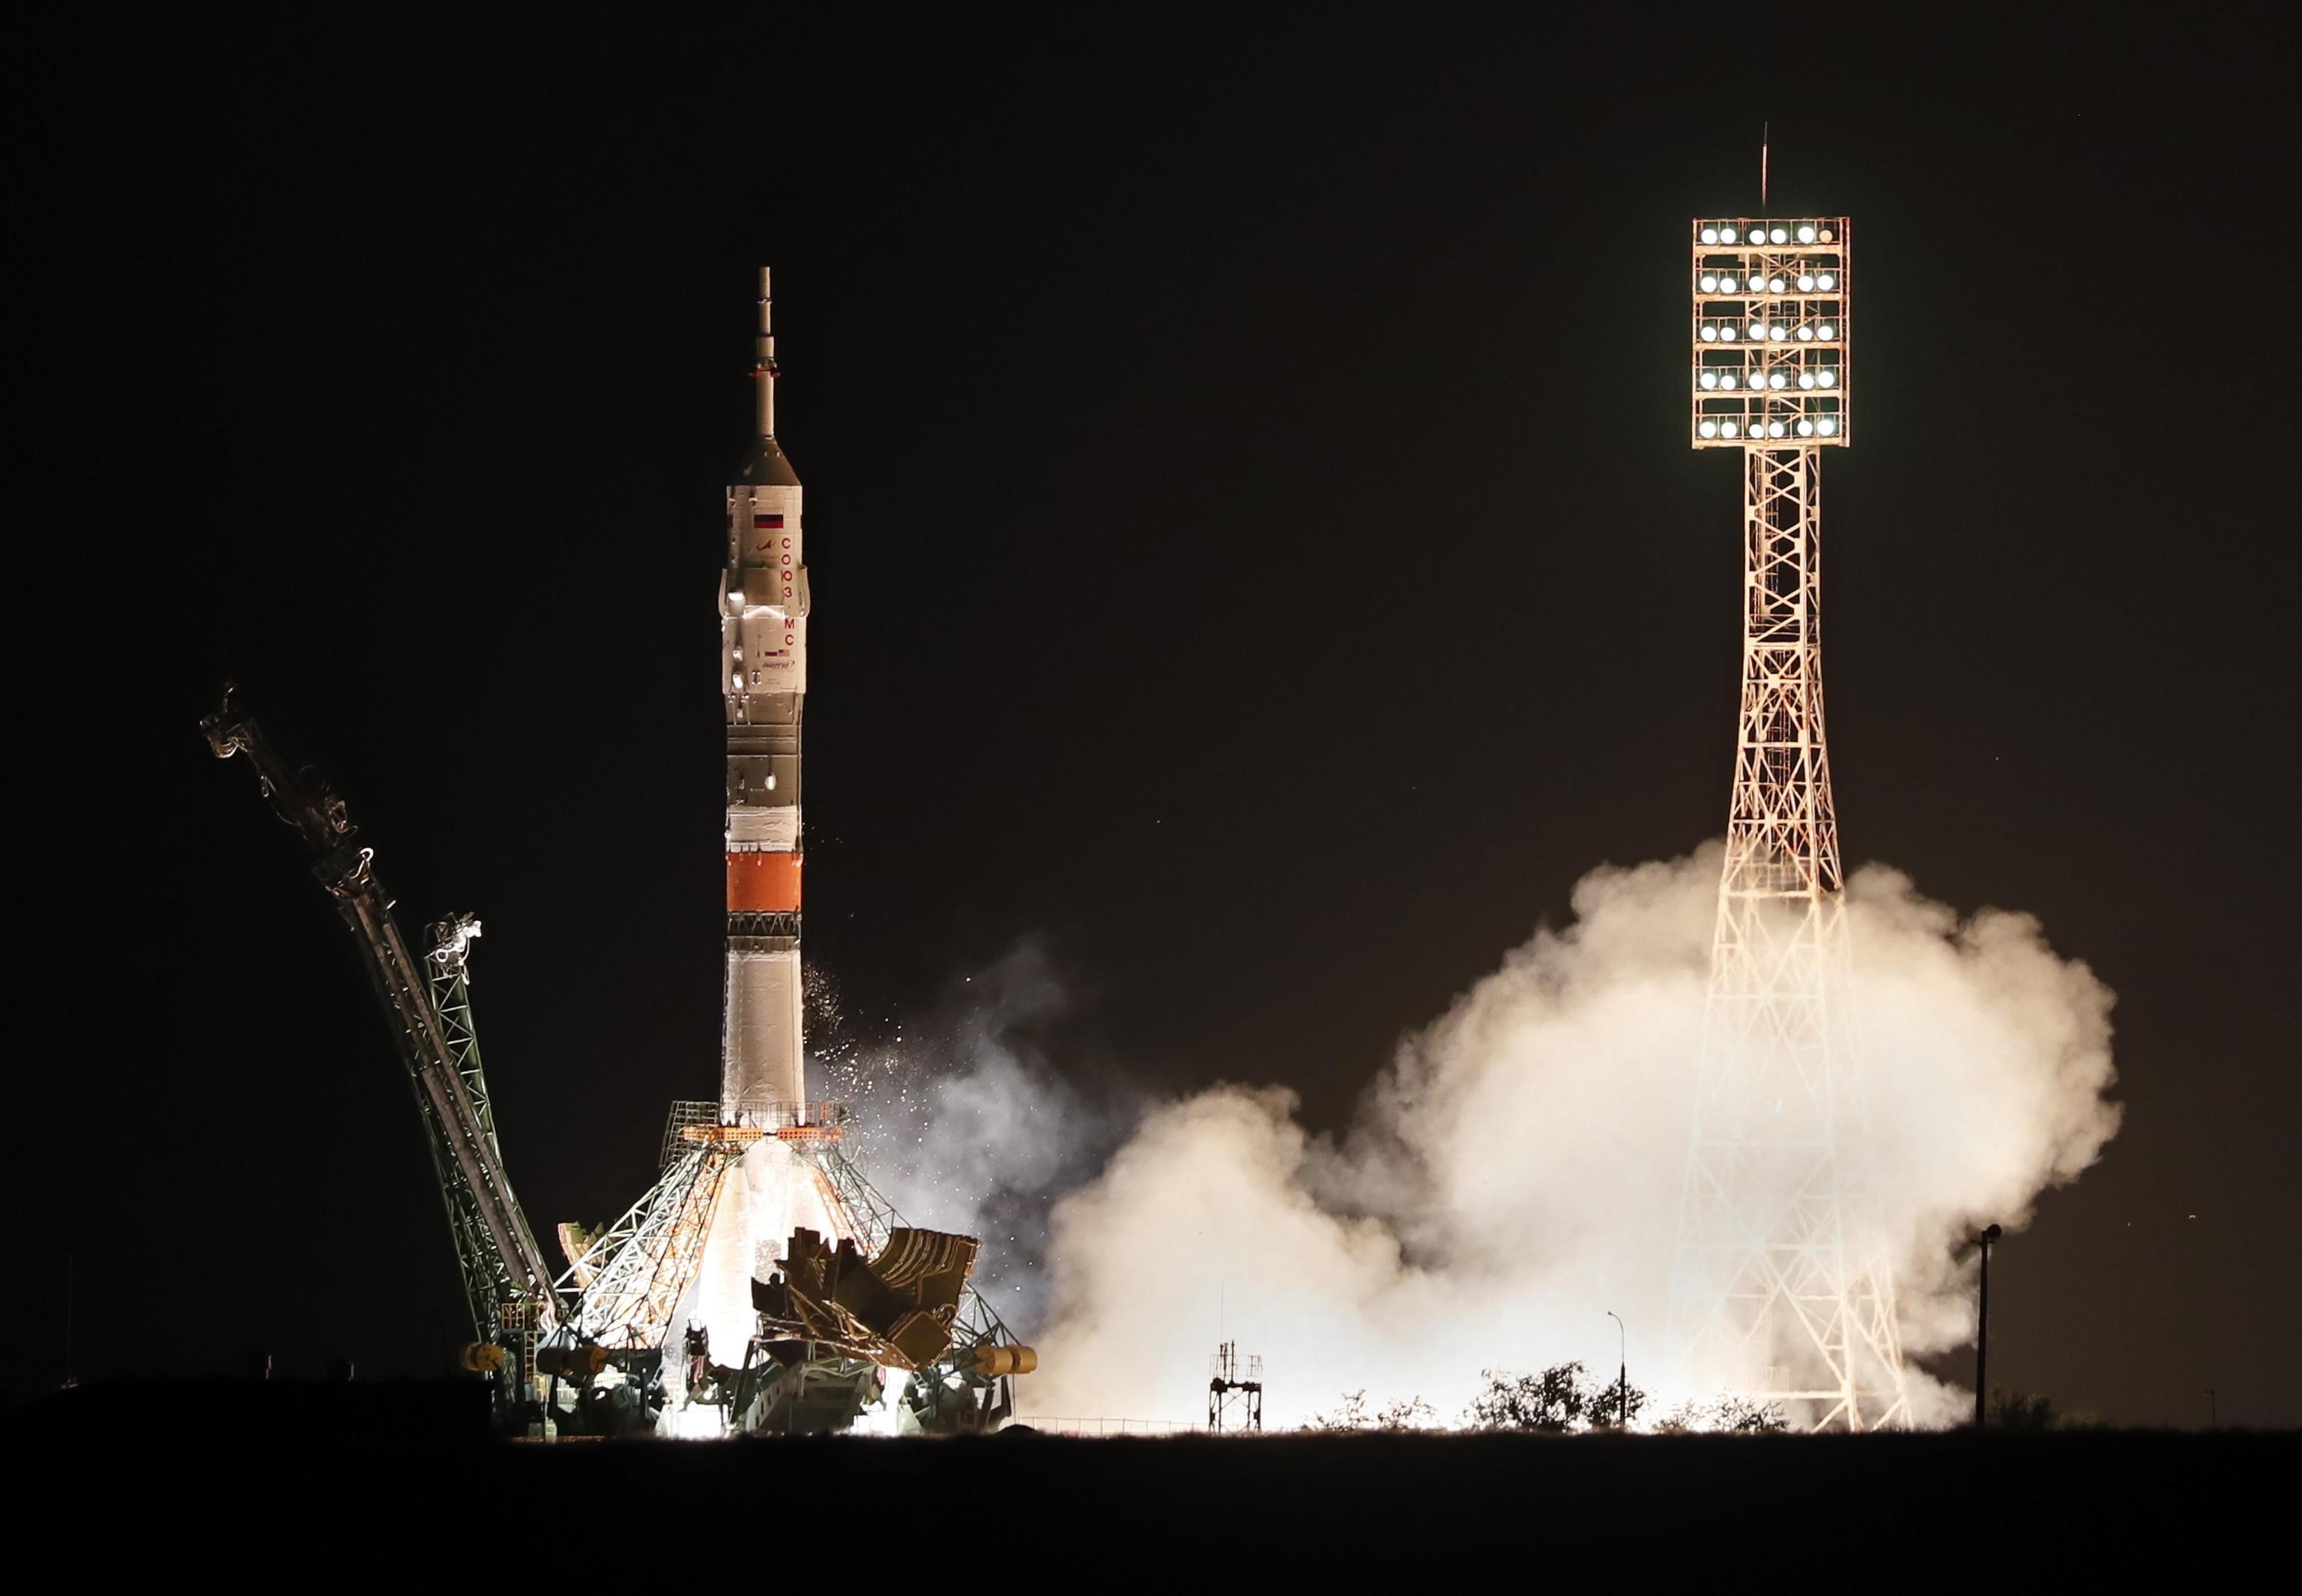 Lanciata la Soyuz, al via la missione  Beyond  con Luca Parmitano